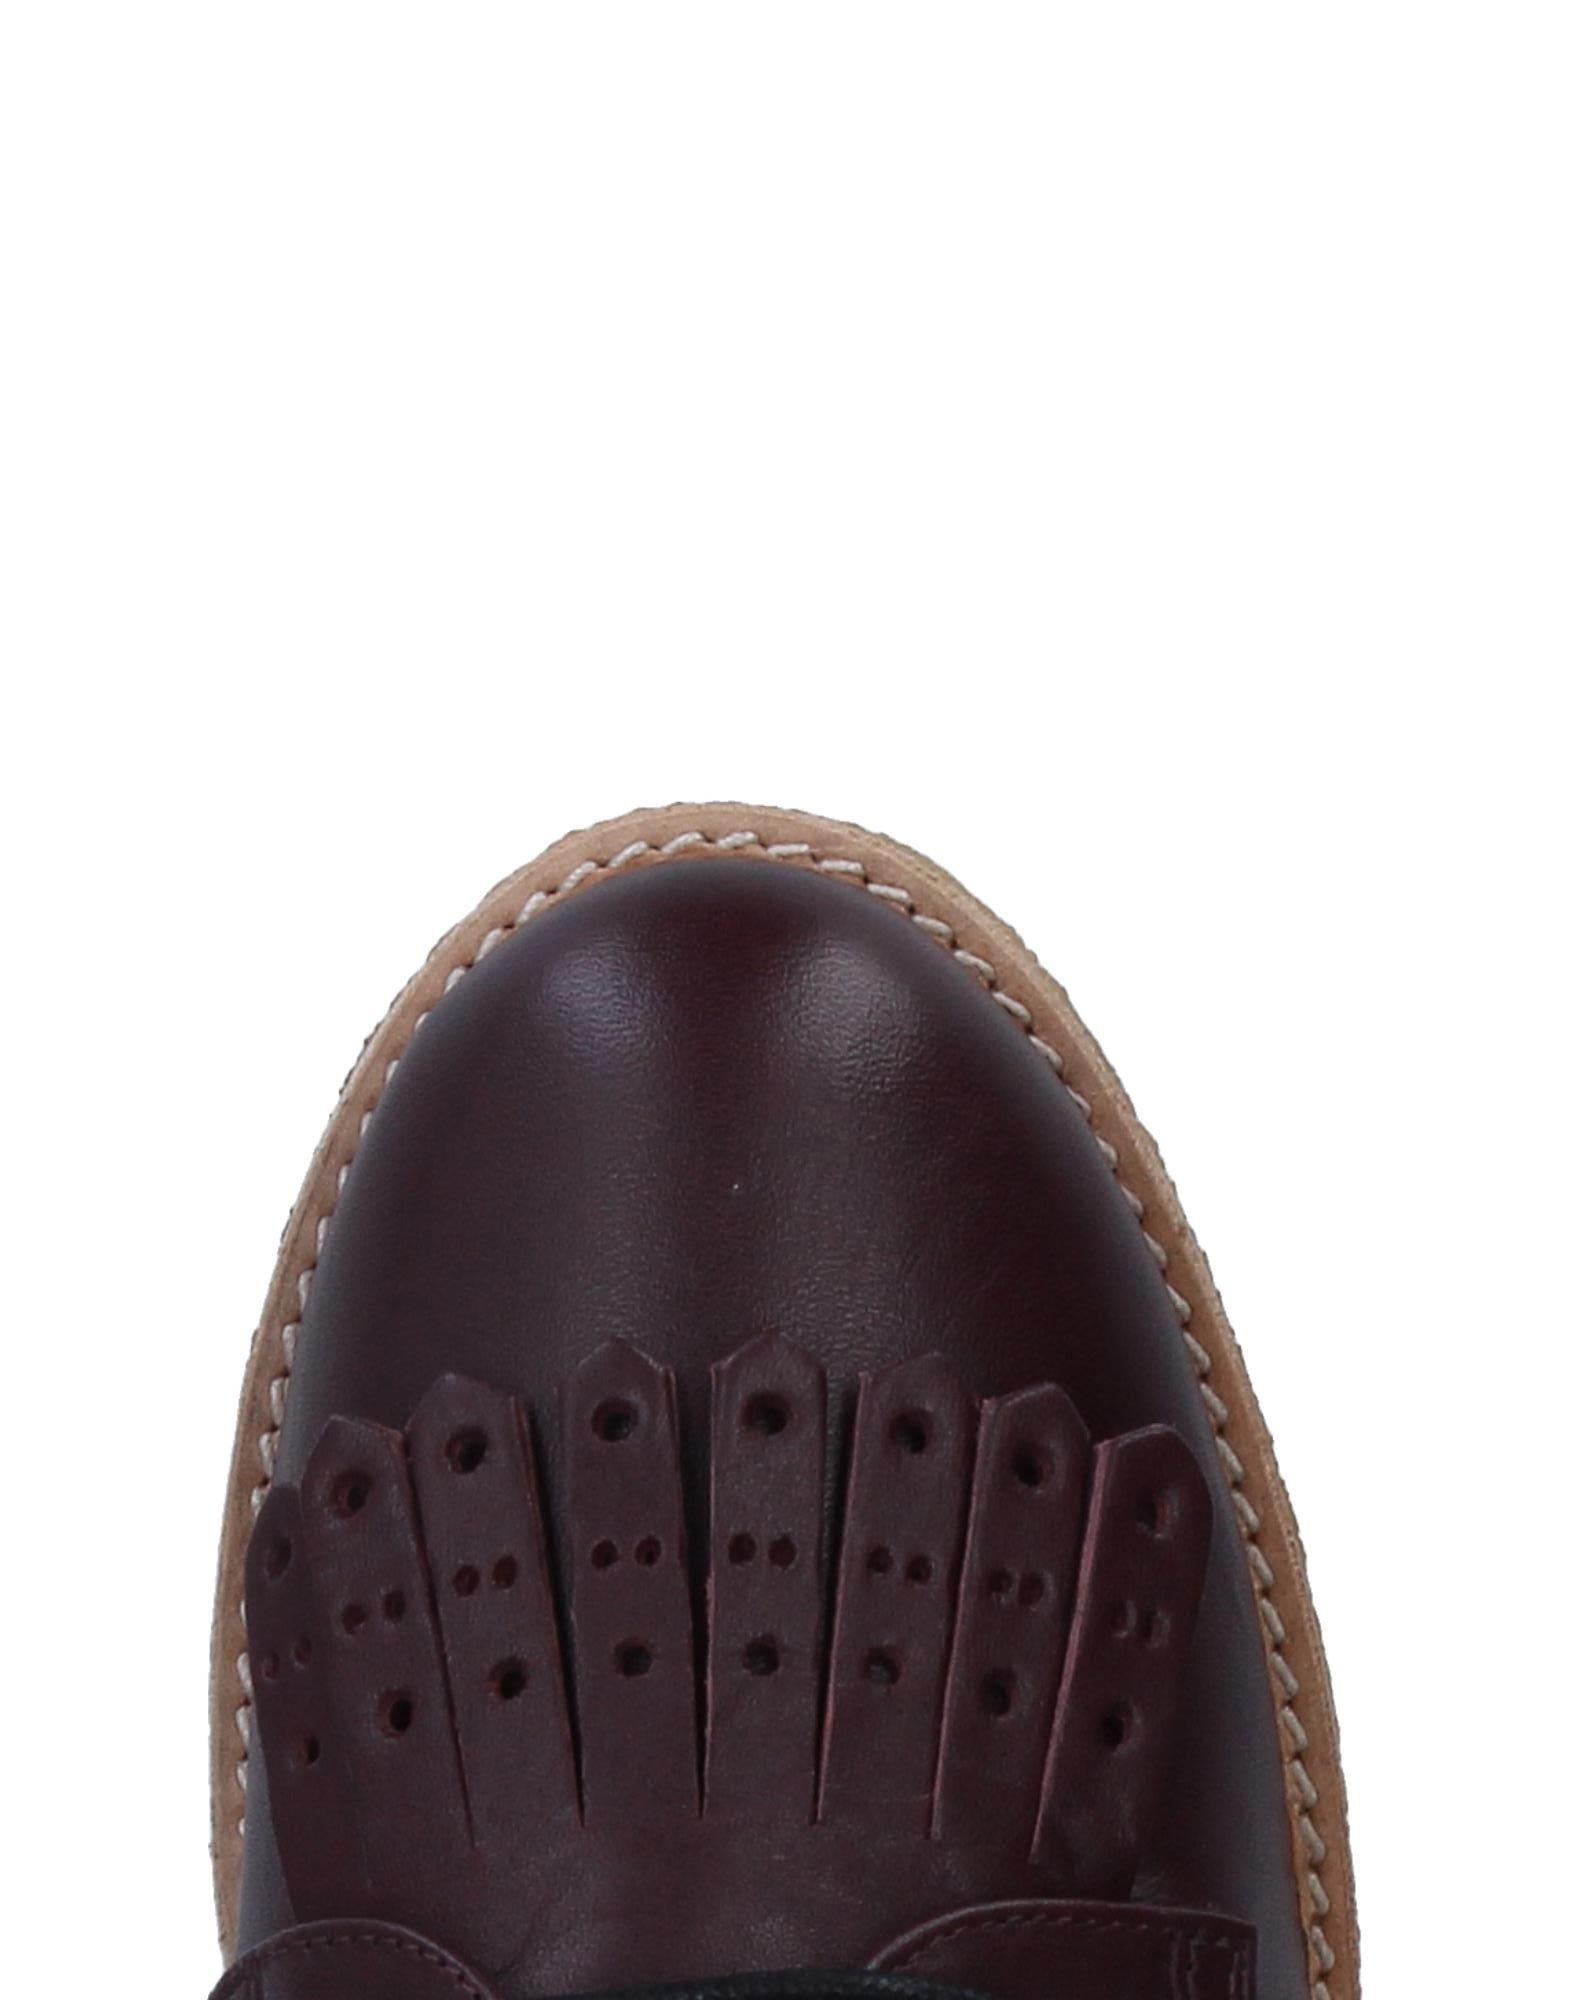 Schuhe Logan Schnürschuhe Damen  11339574PN Heiße Schuhe  b8a4cc